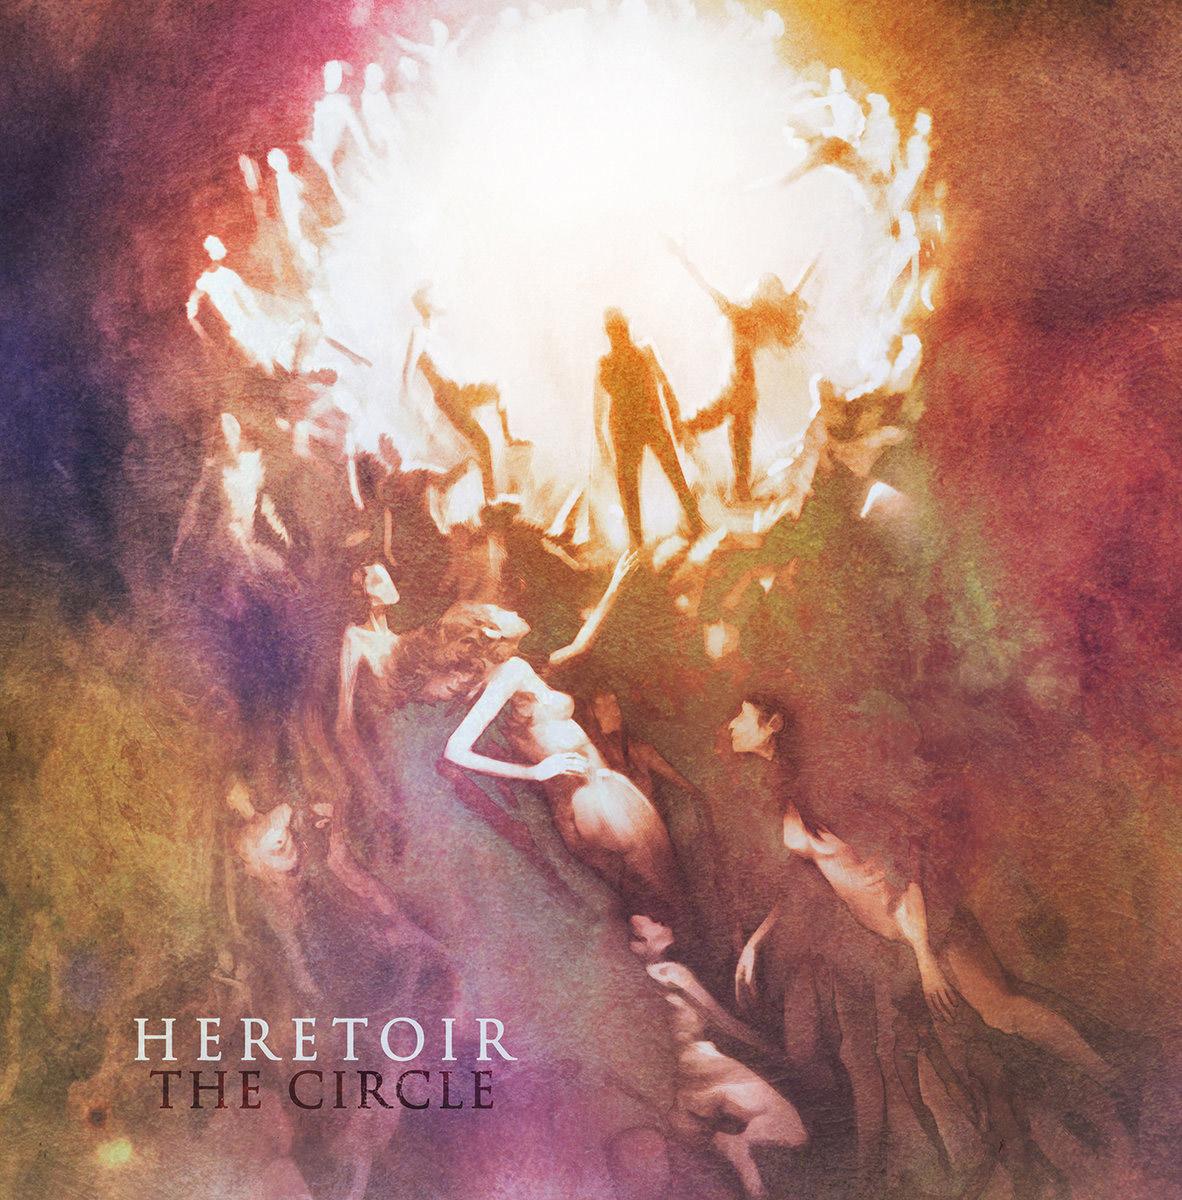 Heretoir - THE CIRCLE